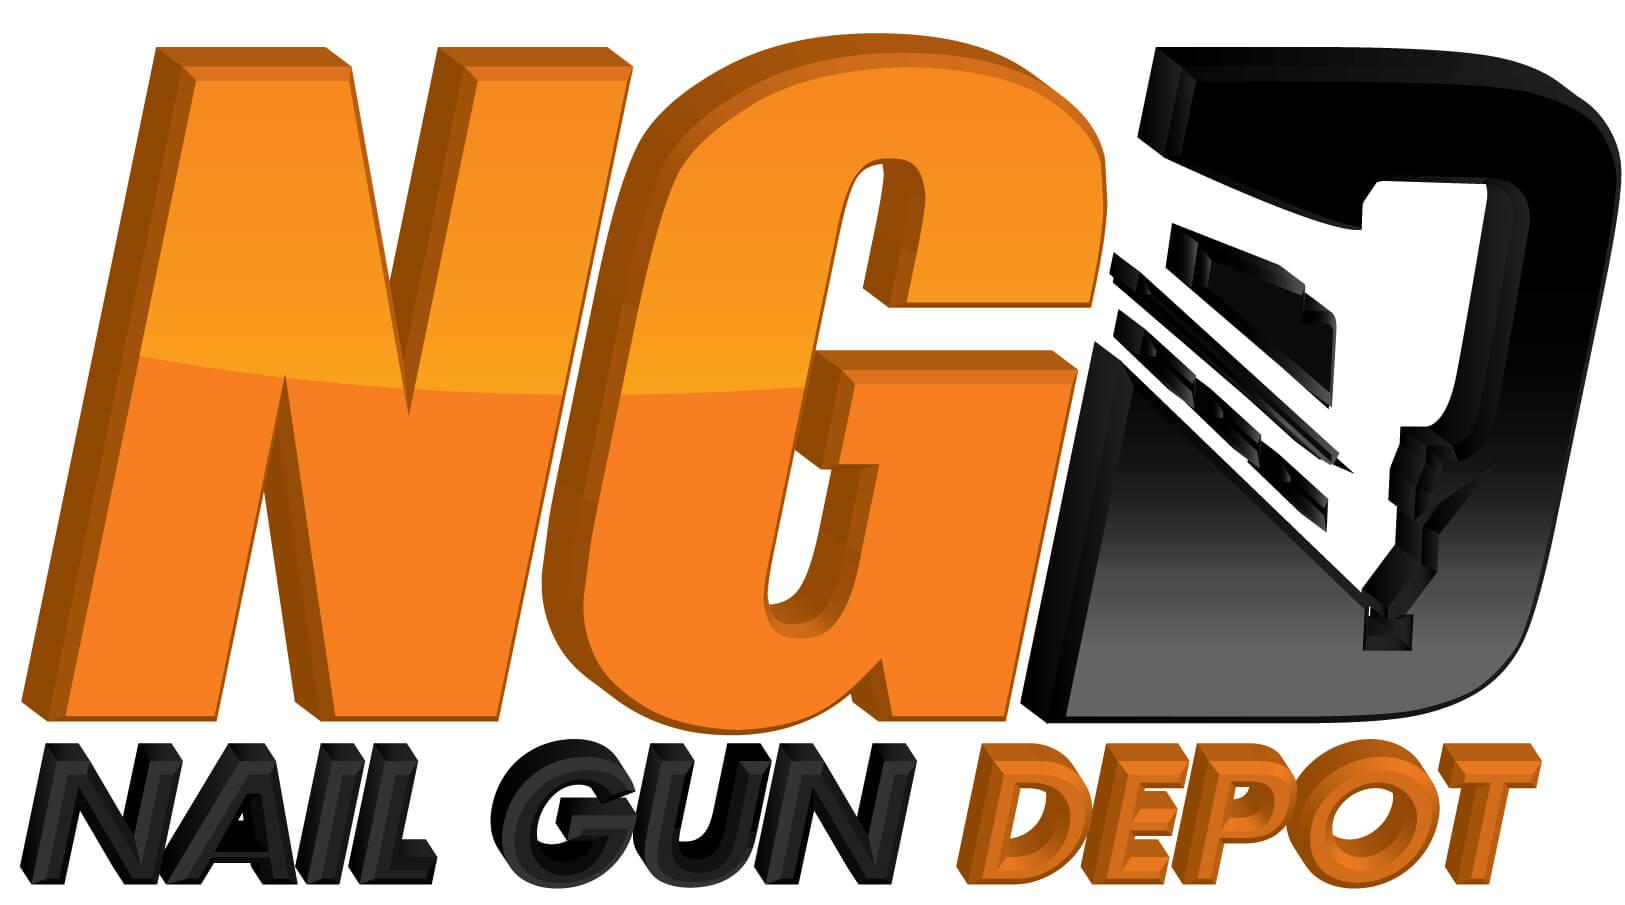 Nail-Gun-Depot-Logo.jpg (361 KB)